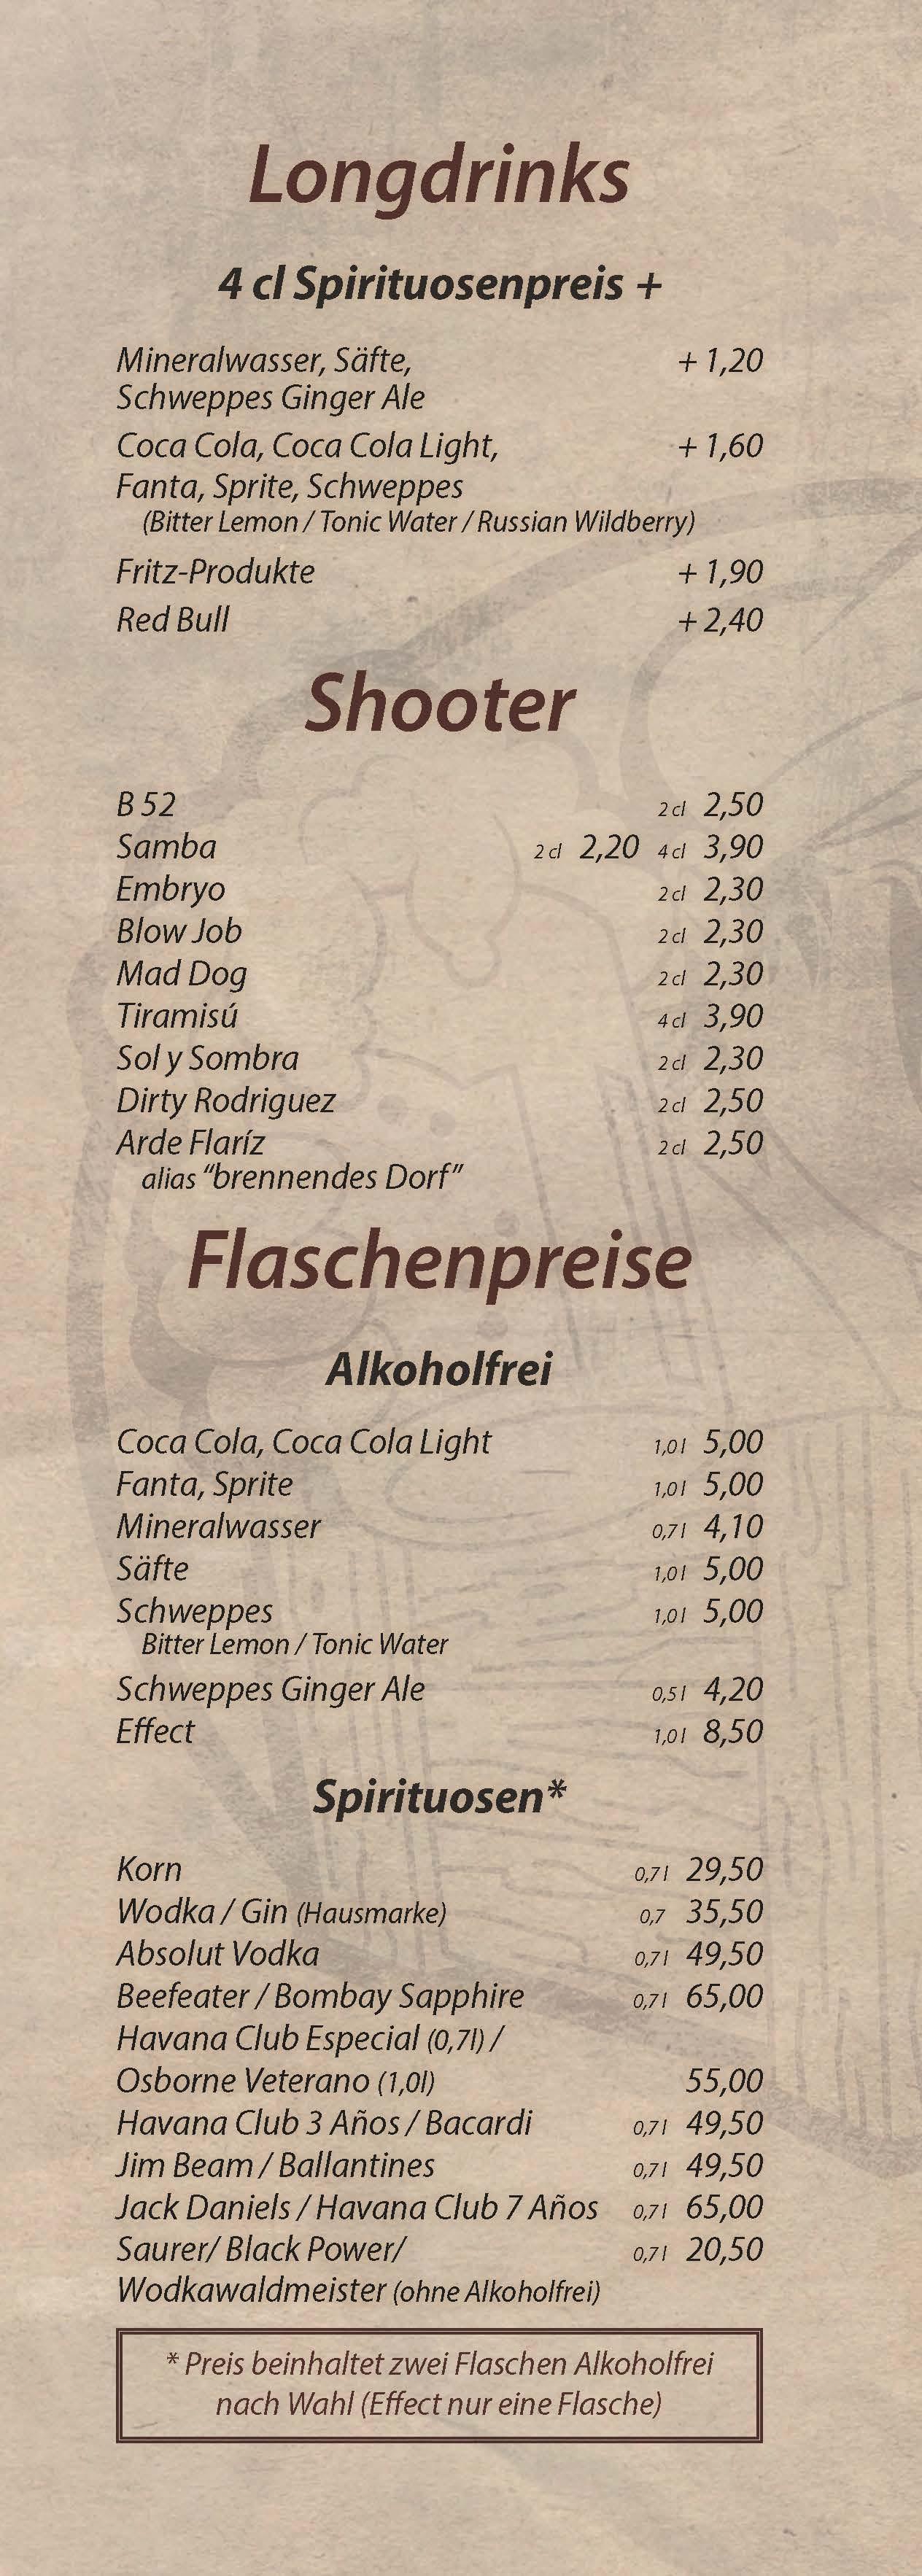 Longdrinks, Shooter, Flschenpreise - Cocktailbar Die Kiste in Cuxhaven